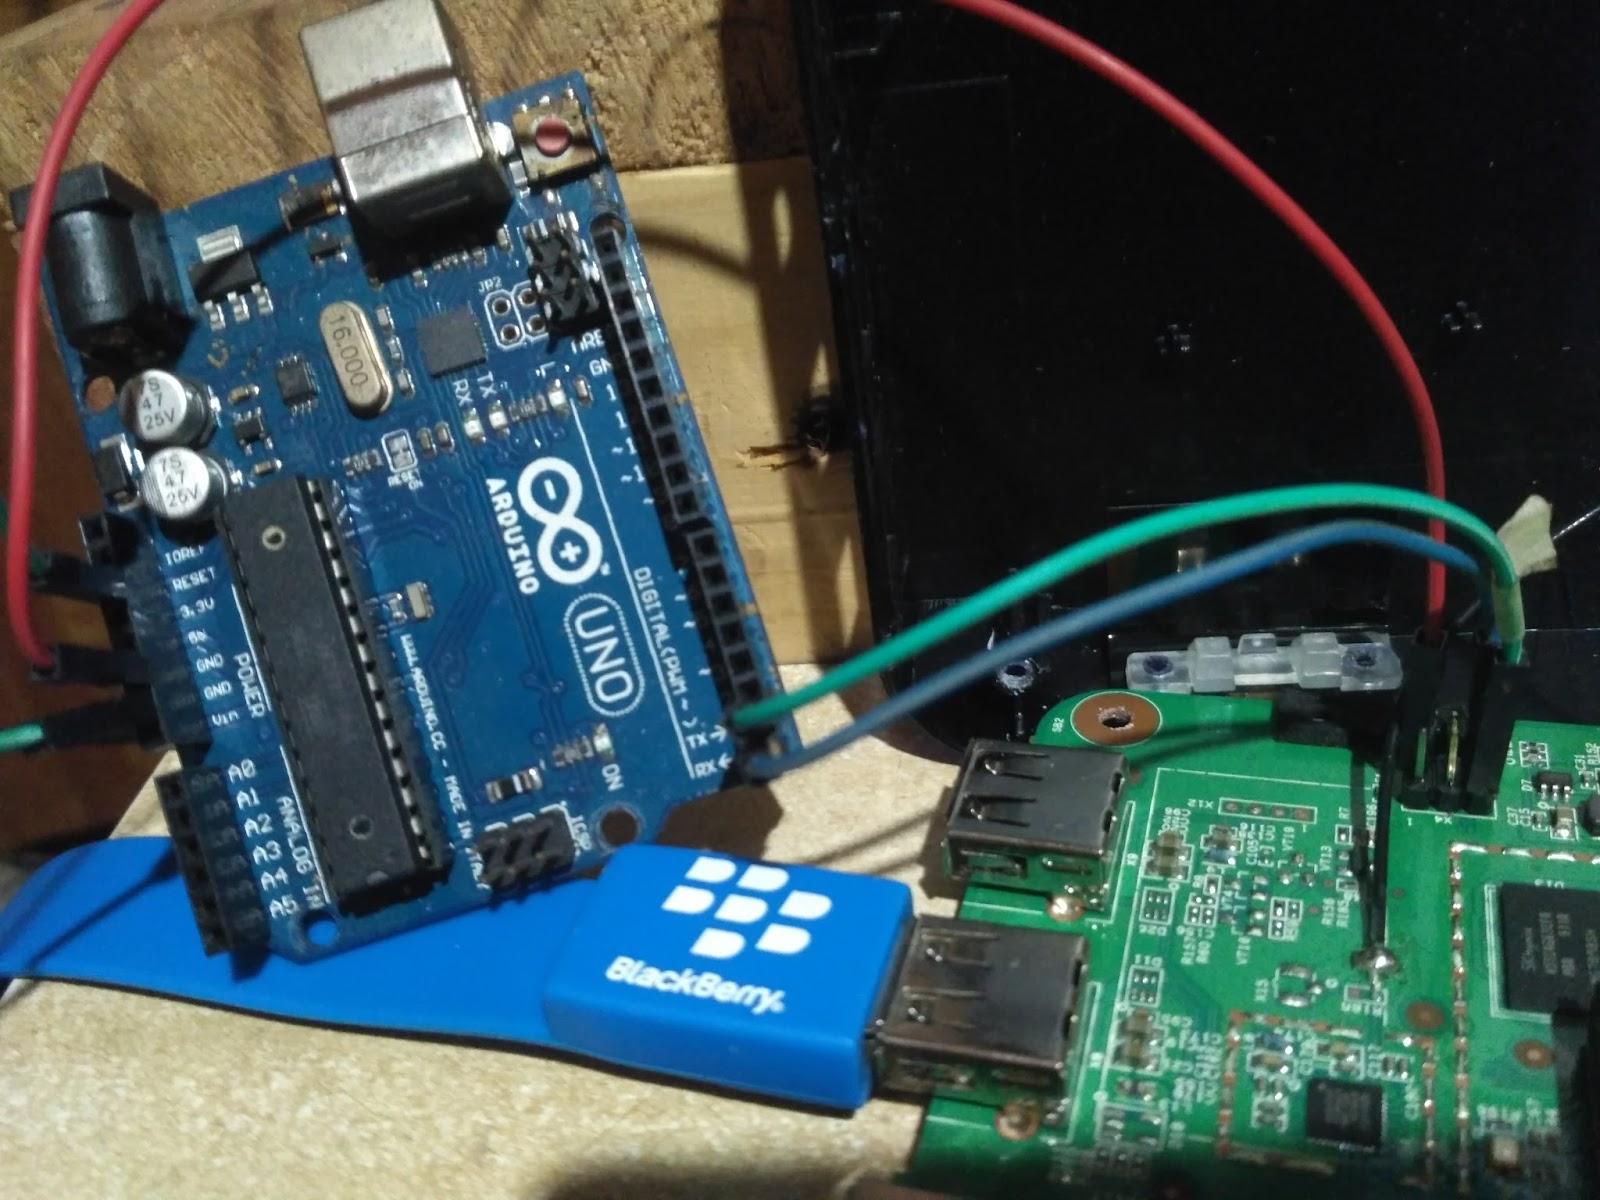 Planyat Inc Void My Warranties Indihome Zte Zxv10 B760h Root Stb 860 Bisa Mouse New Arduino Uno